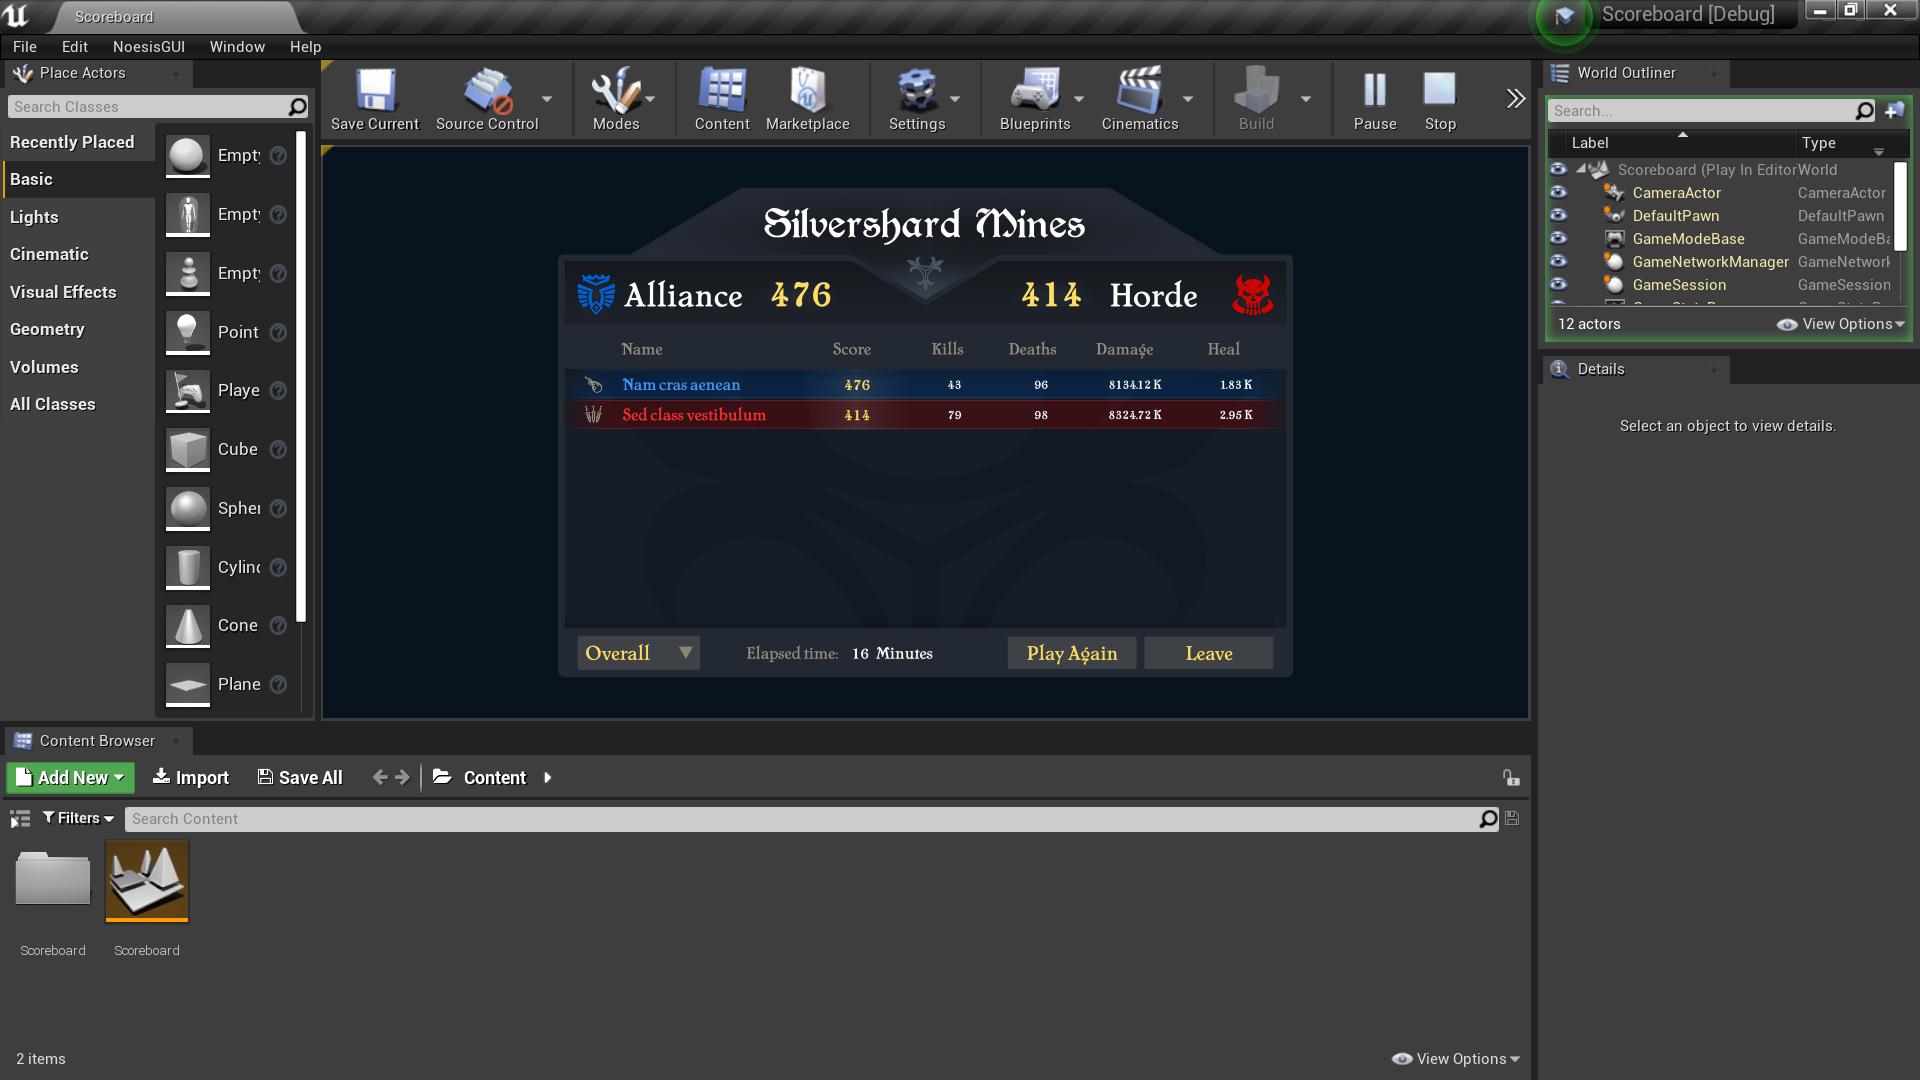 Tutorials/Samples/Scoreboard/UE4 at master · Noesis